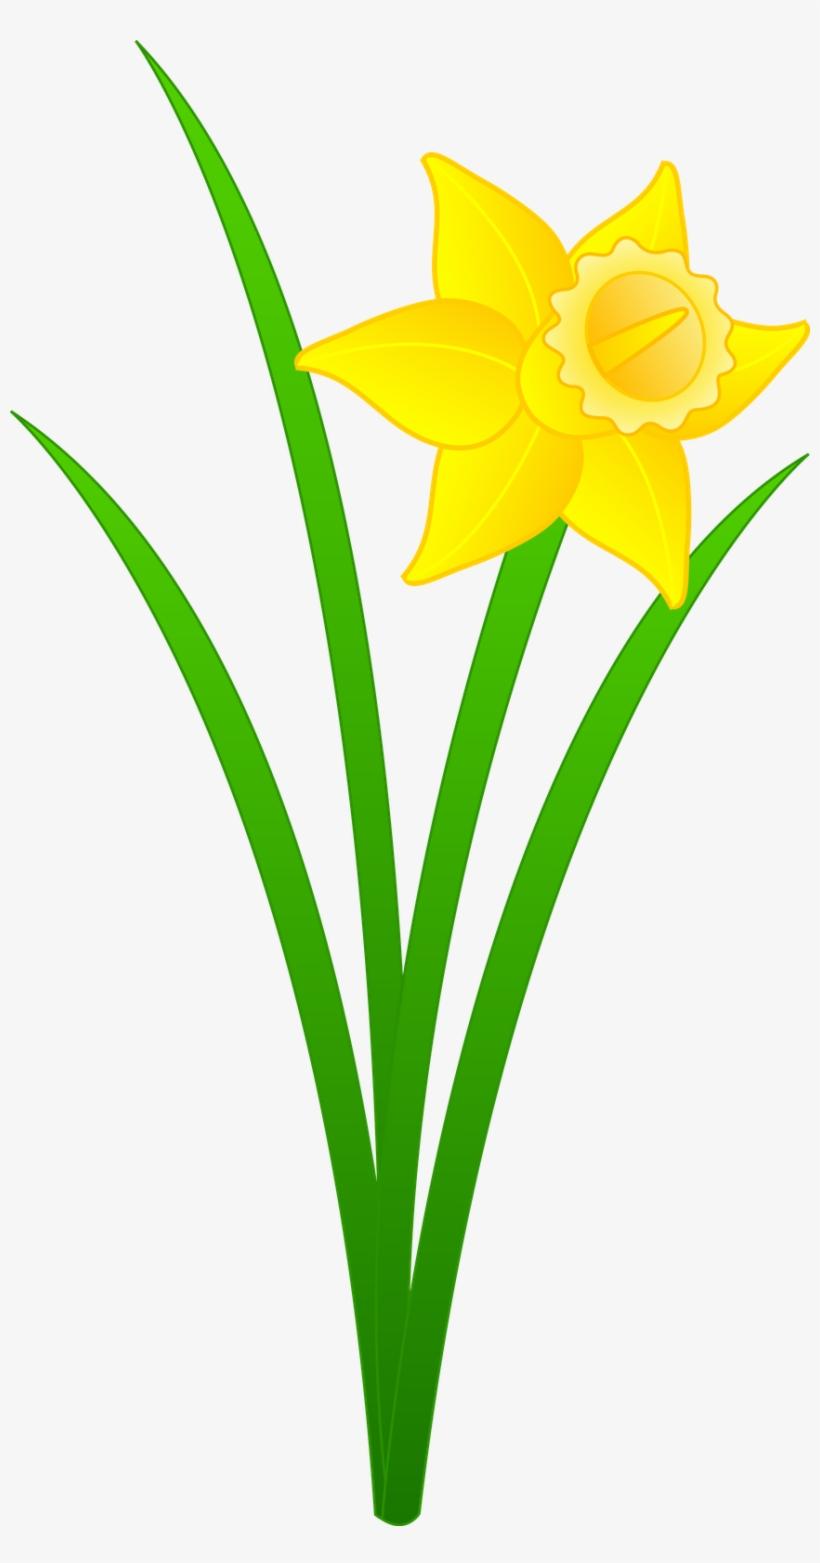 . Daffodil clipart flower blossom